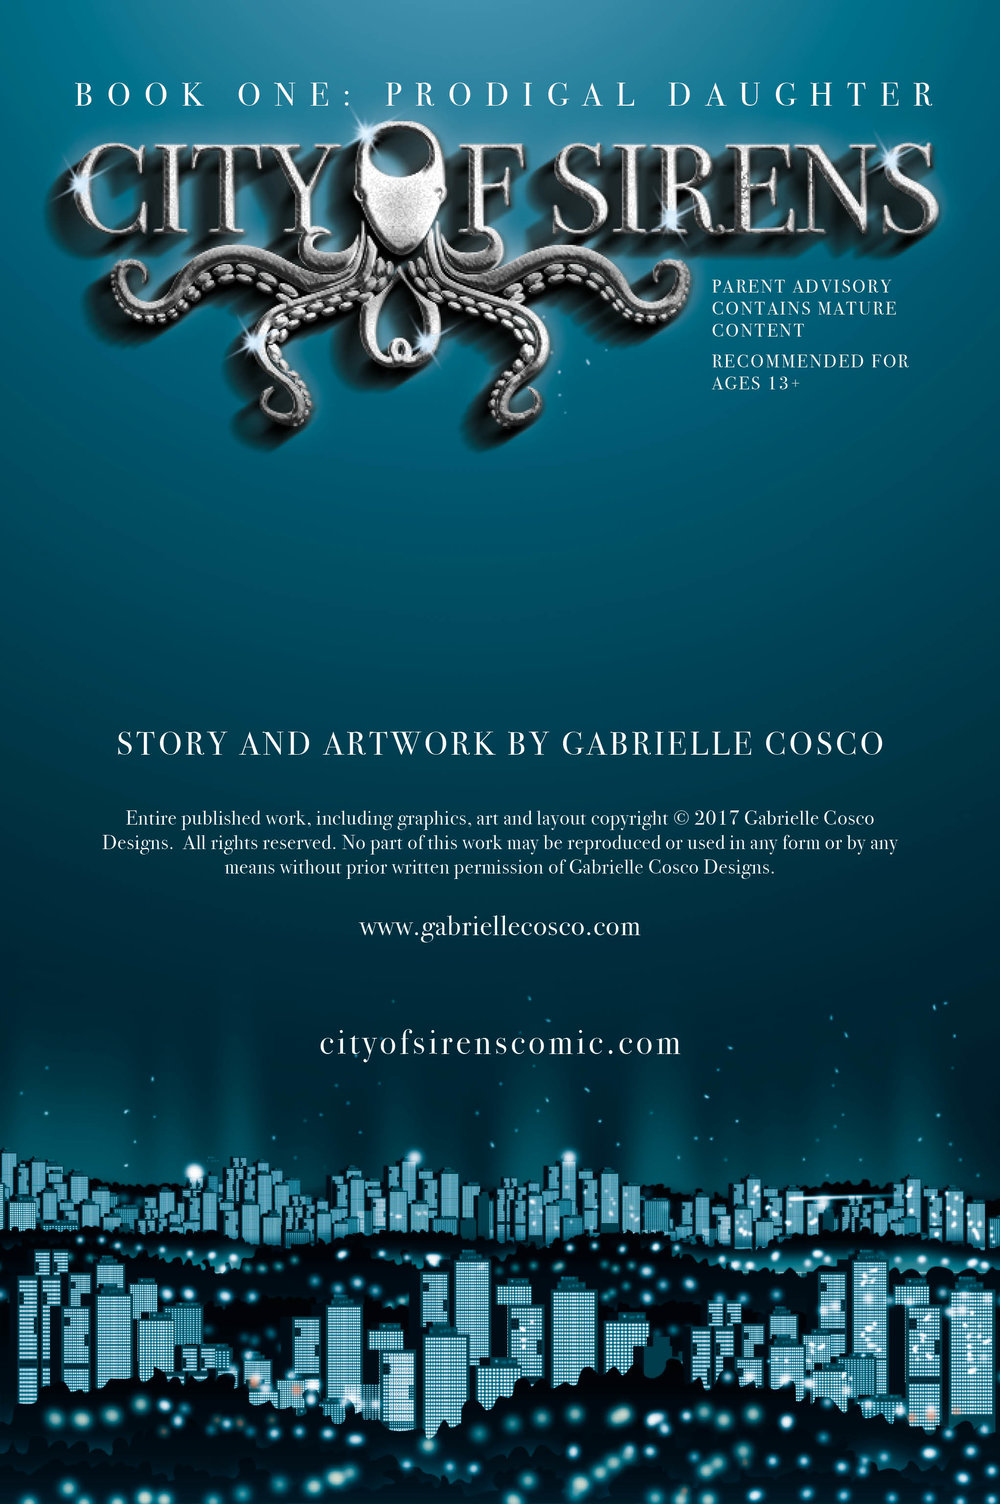 Siren-city-book-one-teaser3.jpg